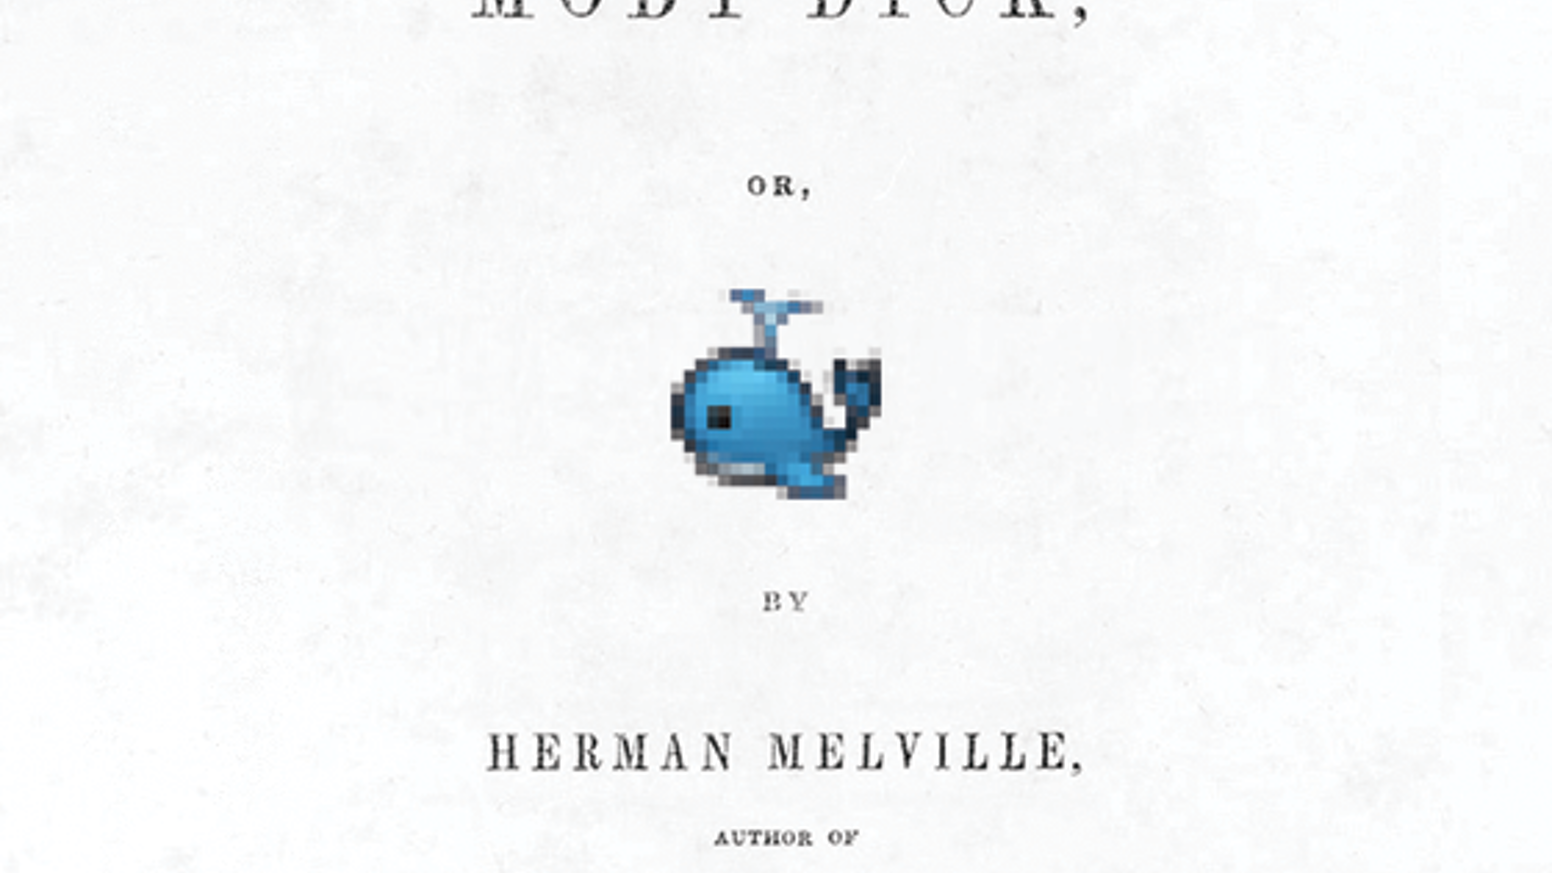 Translating Moby Dick into Japanese Emoji Icons using Amazon's Mechanical Turk.